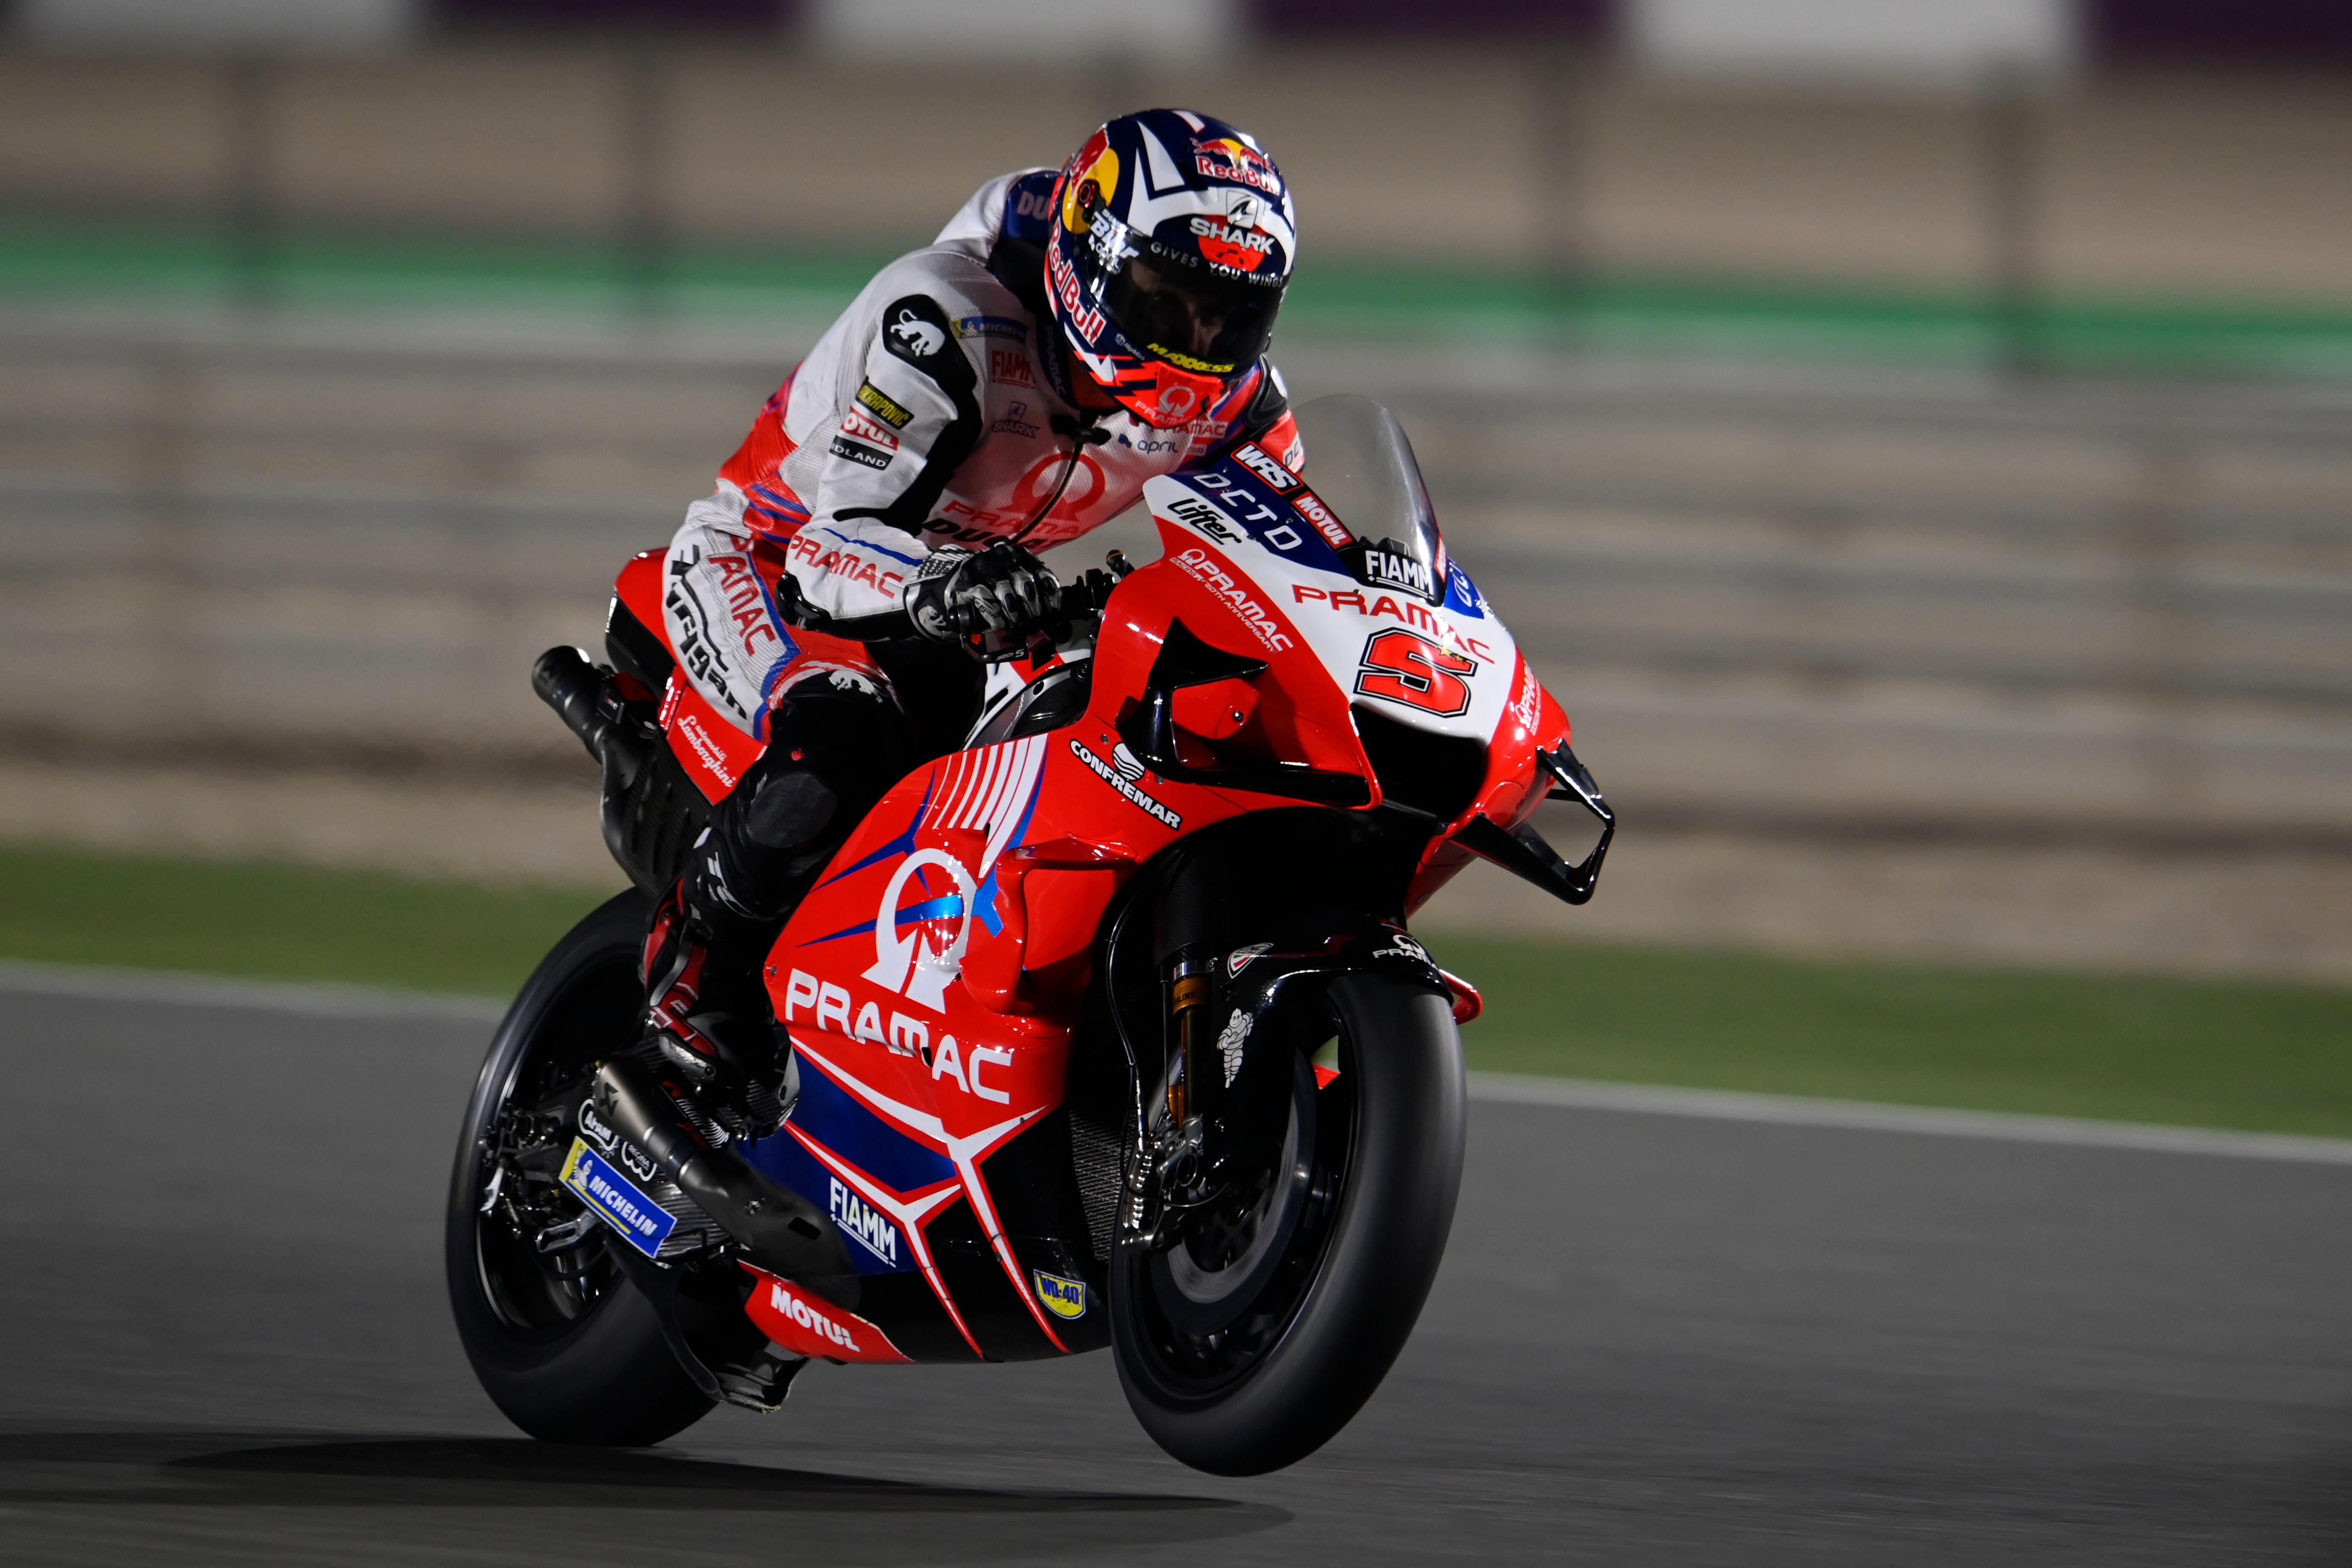 Johann Zarco, Pramac Ducati, Qatar pre-season test